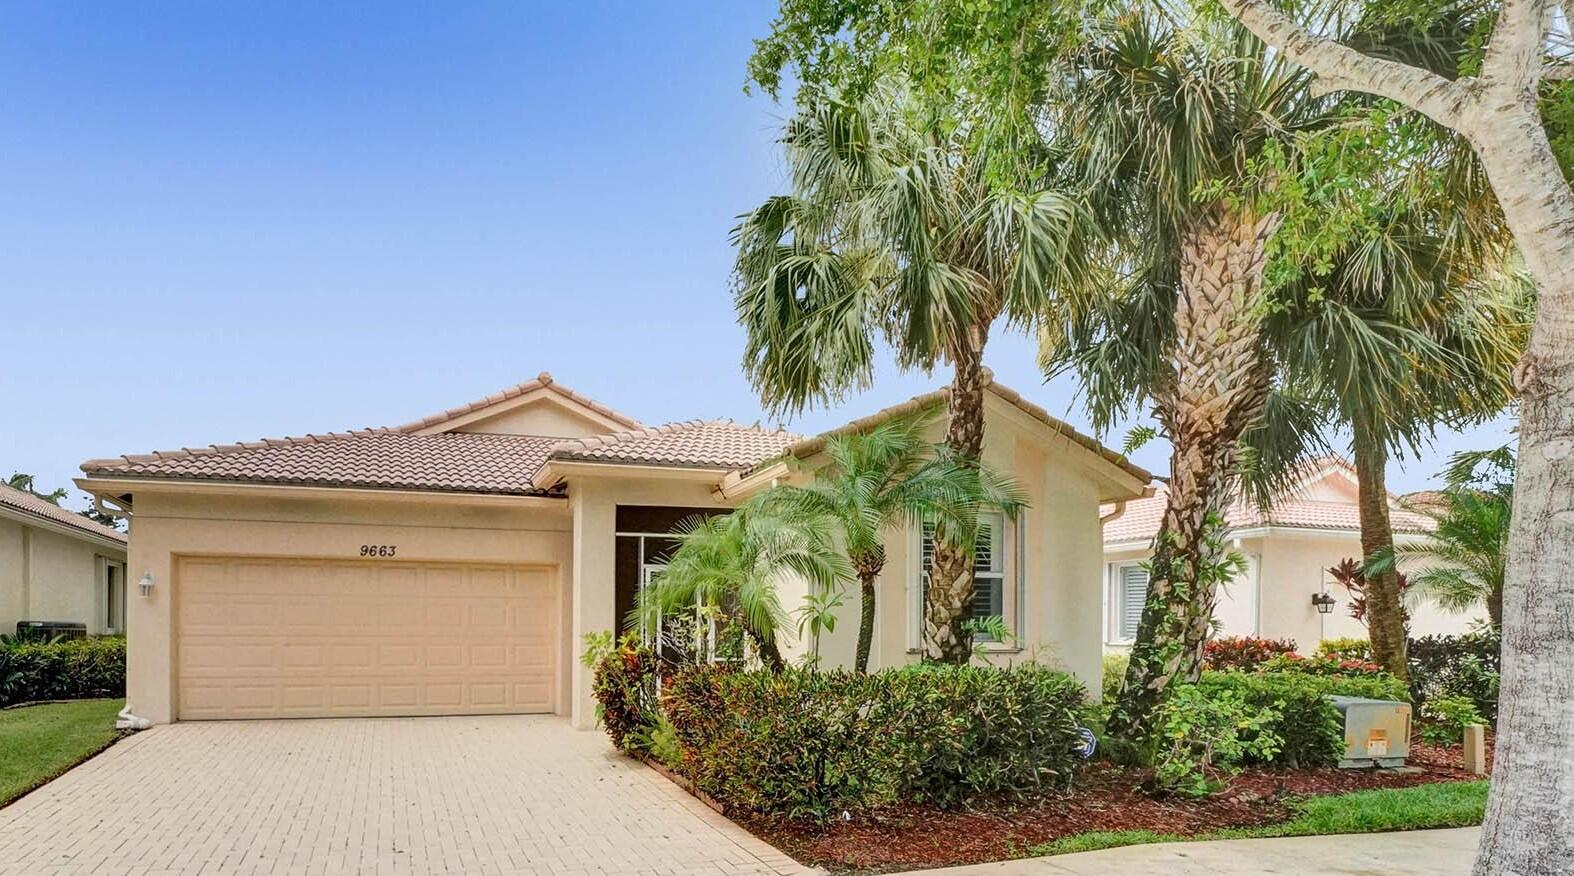 9663  Great Egret Court  For Sale 10735262, FL